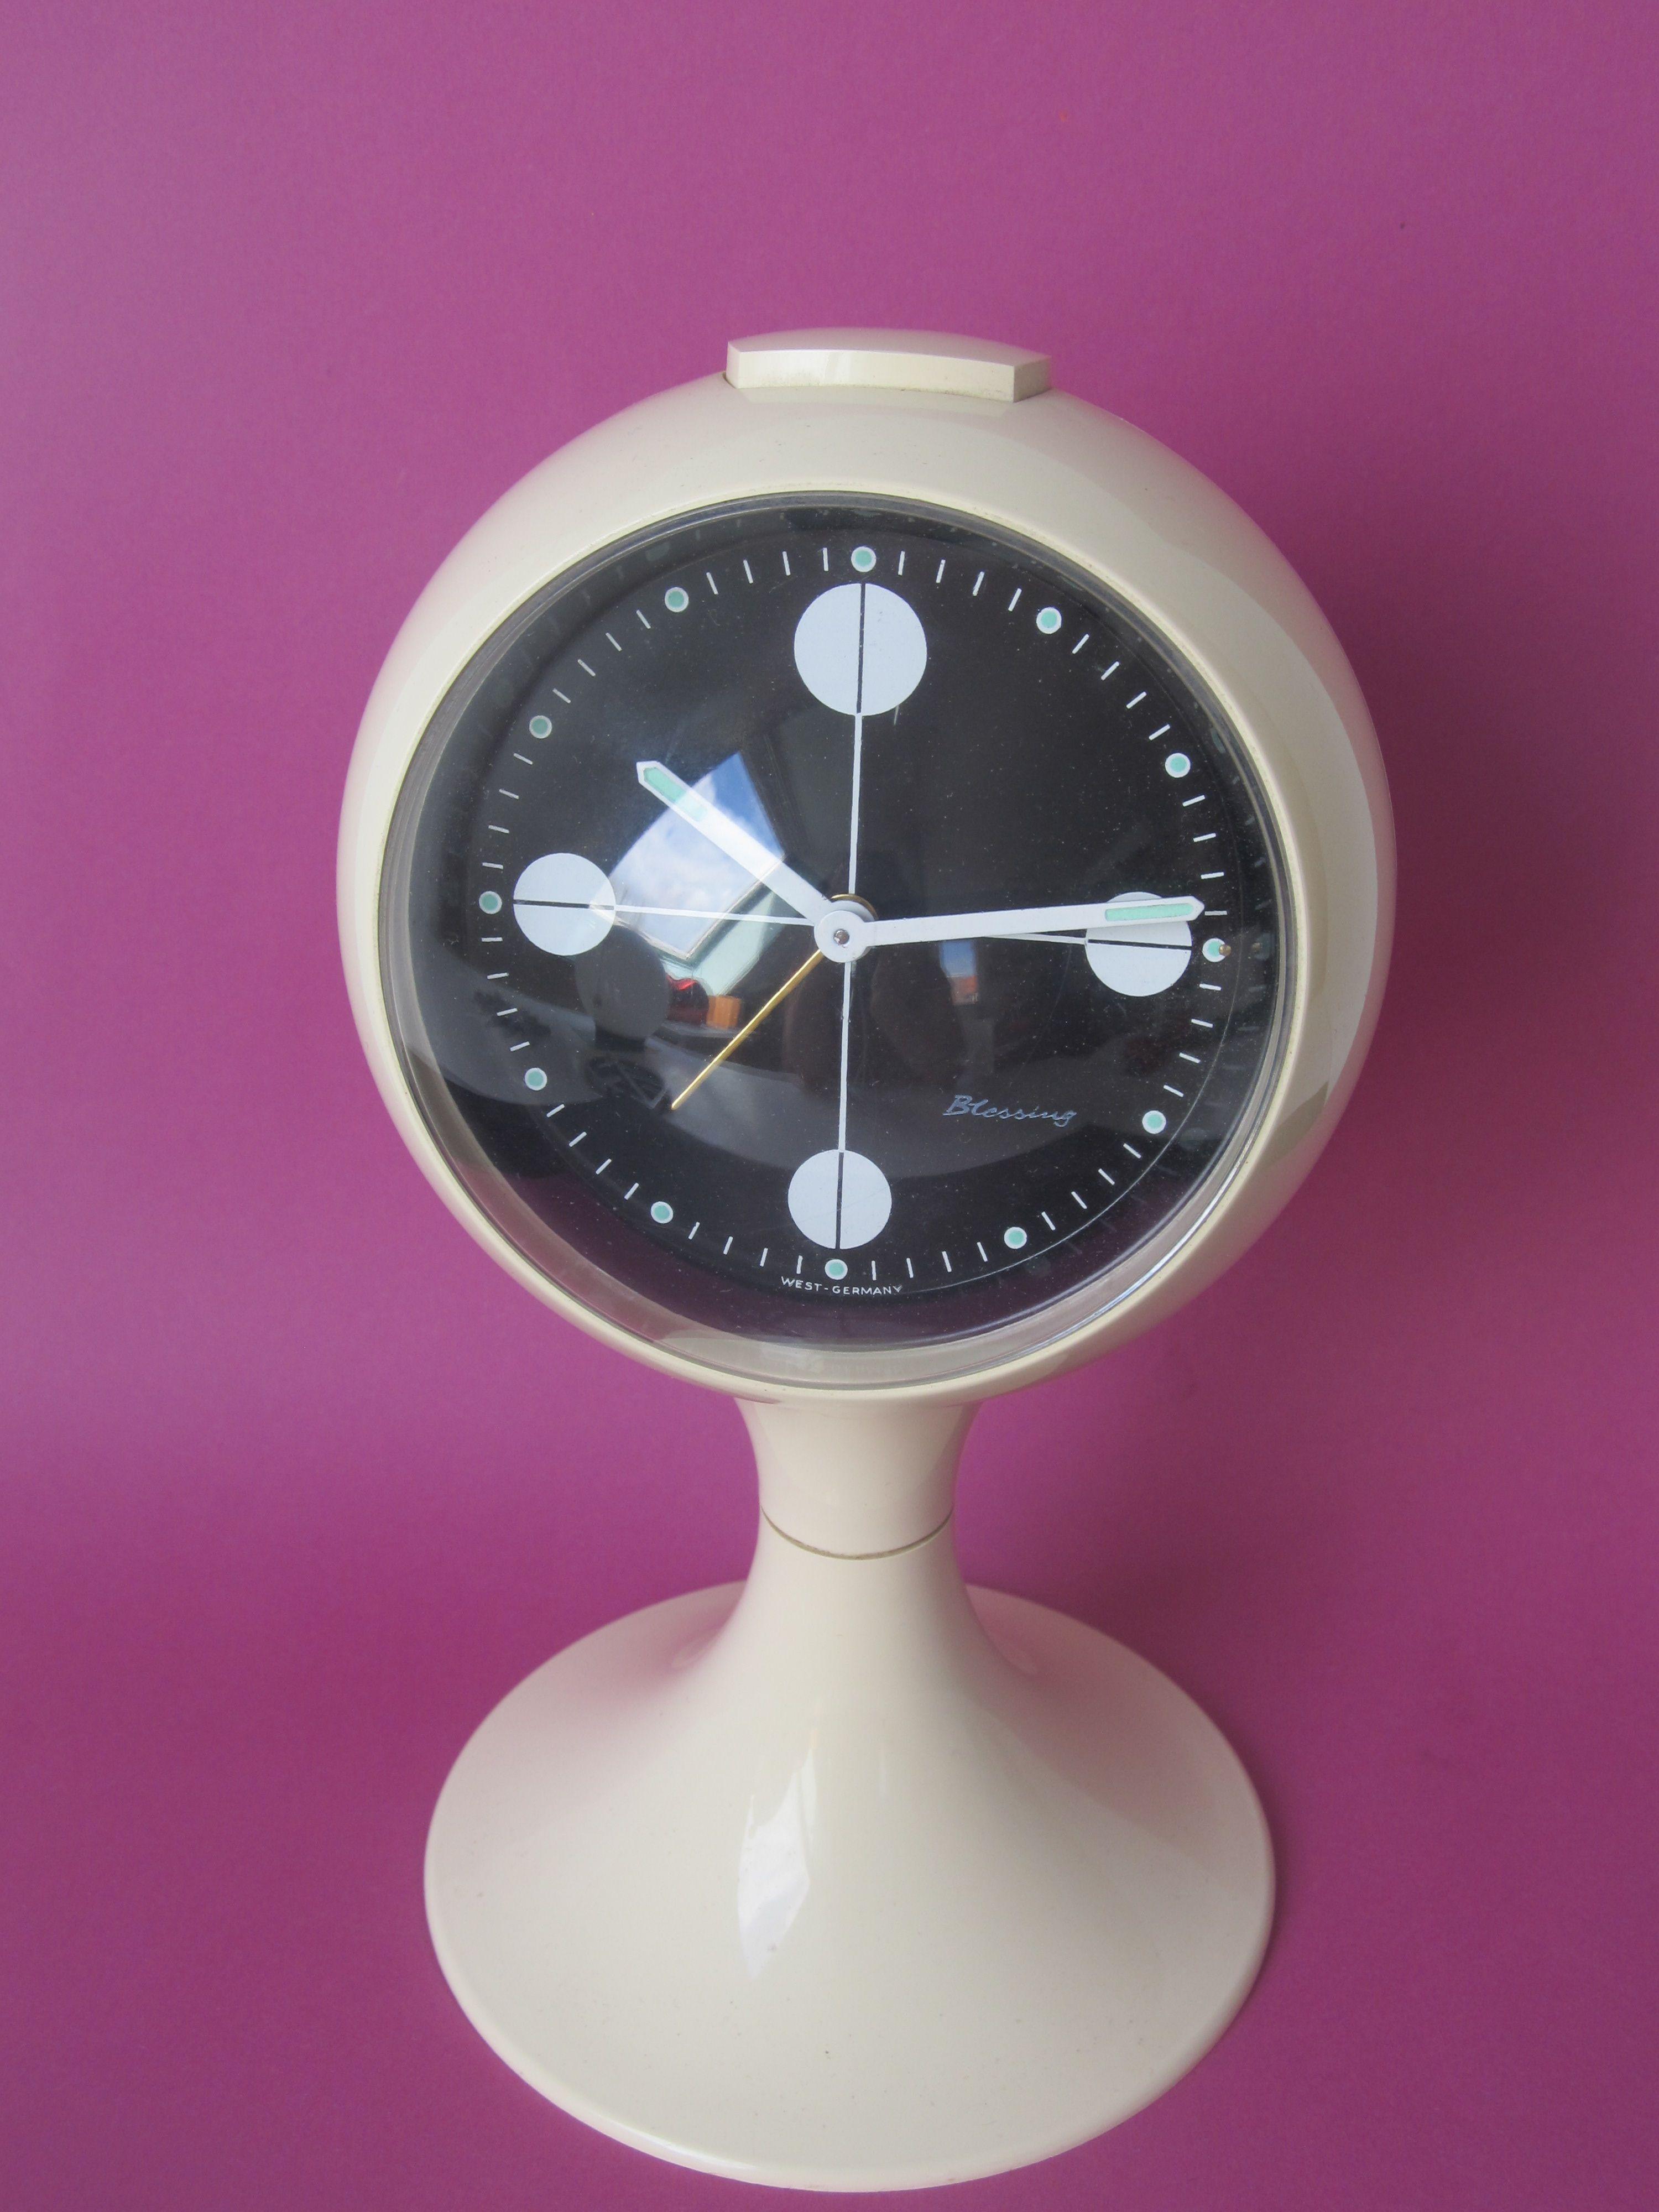 Blessing Clock